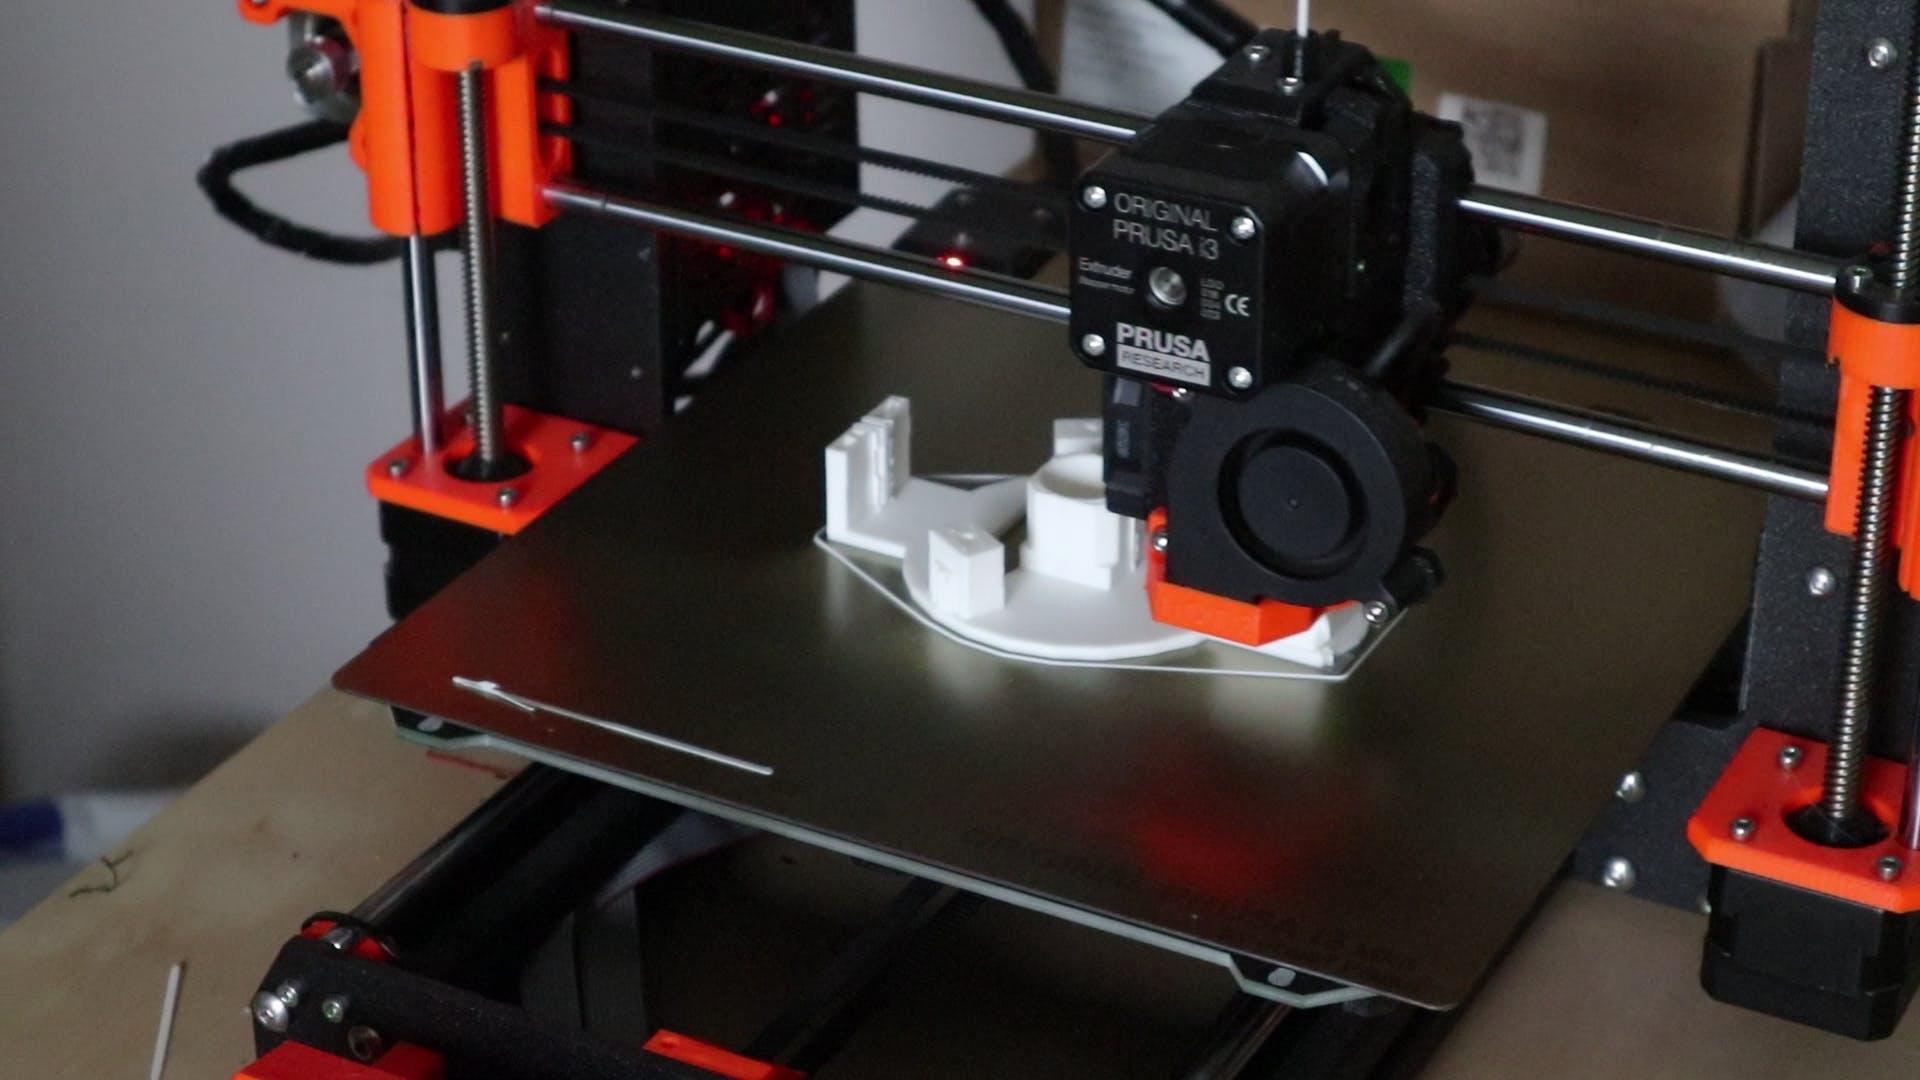 Printing the gondola